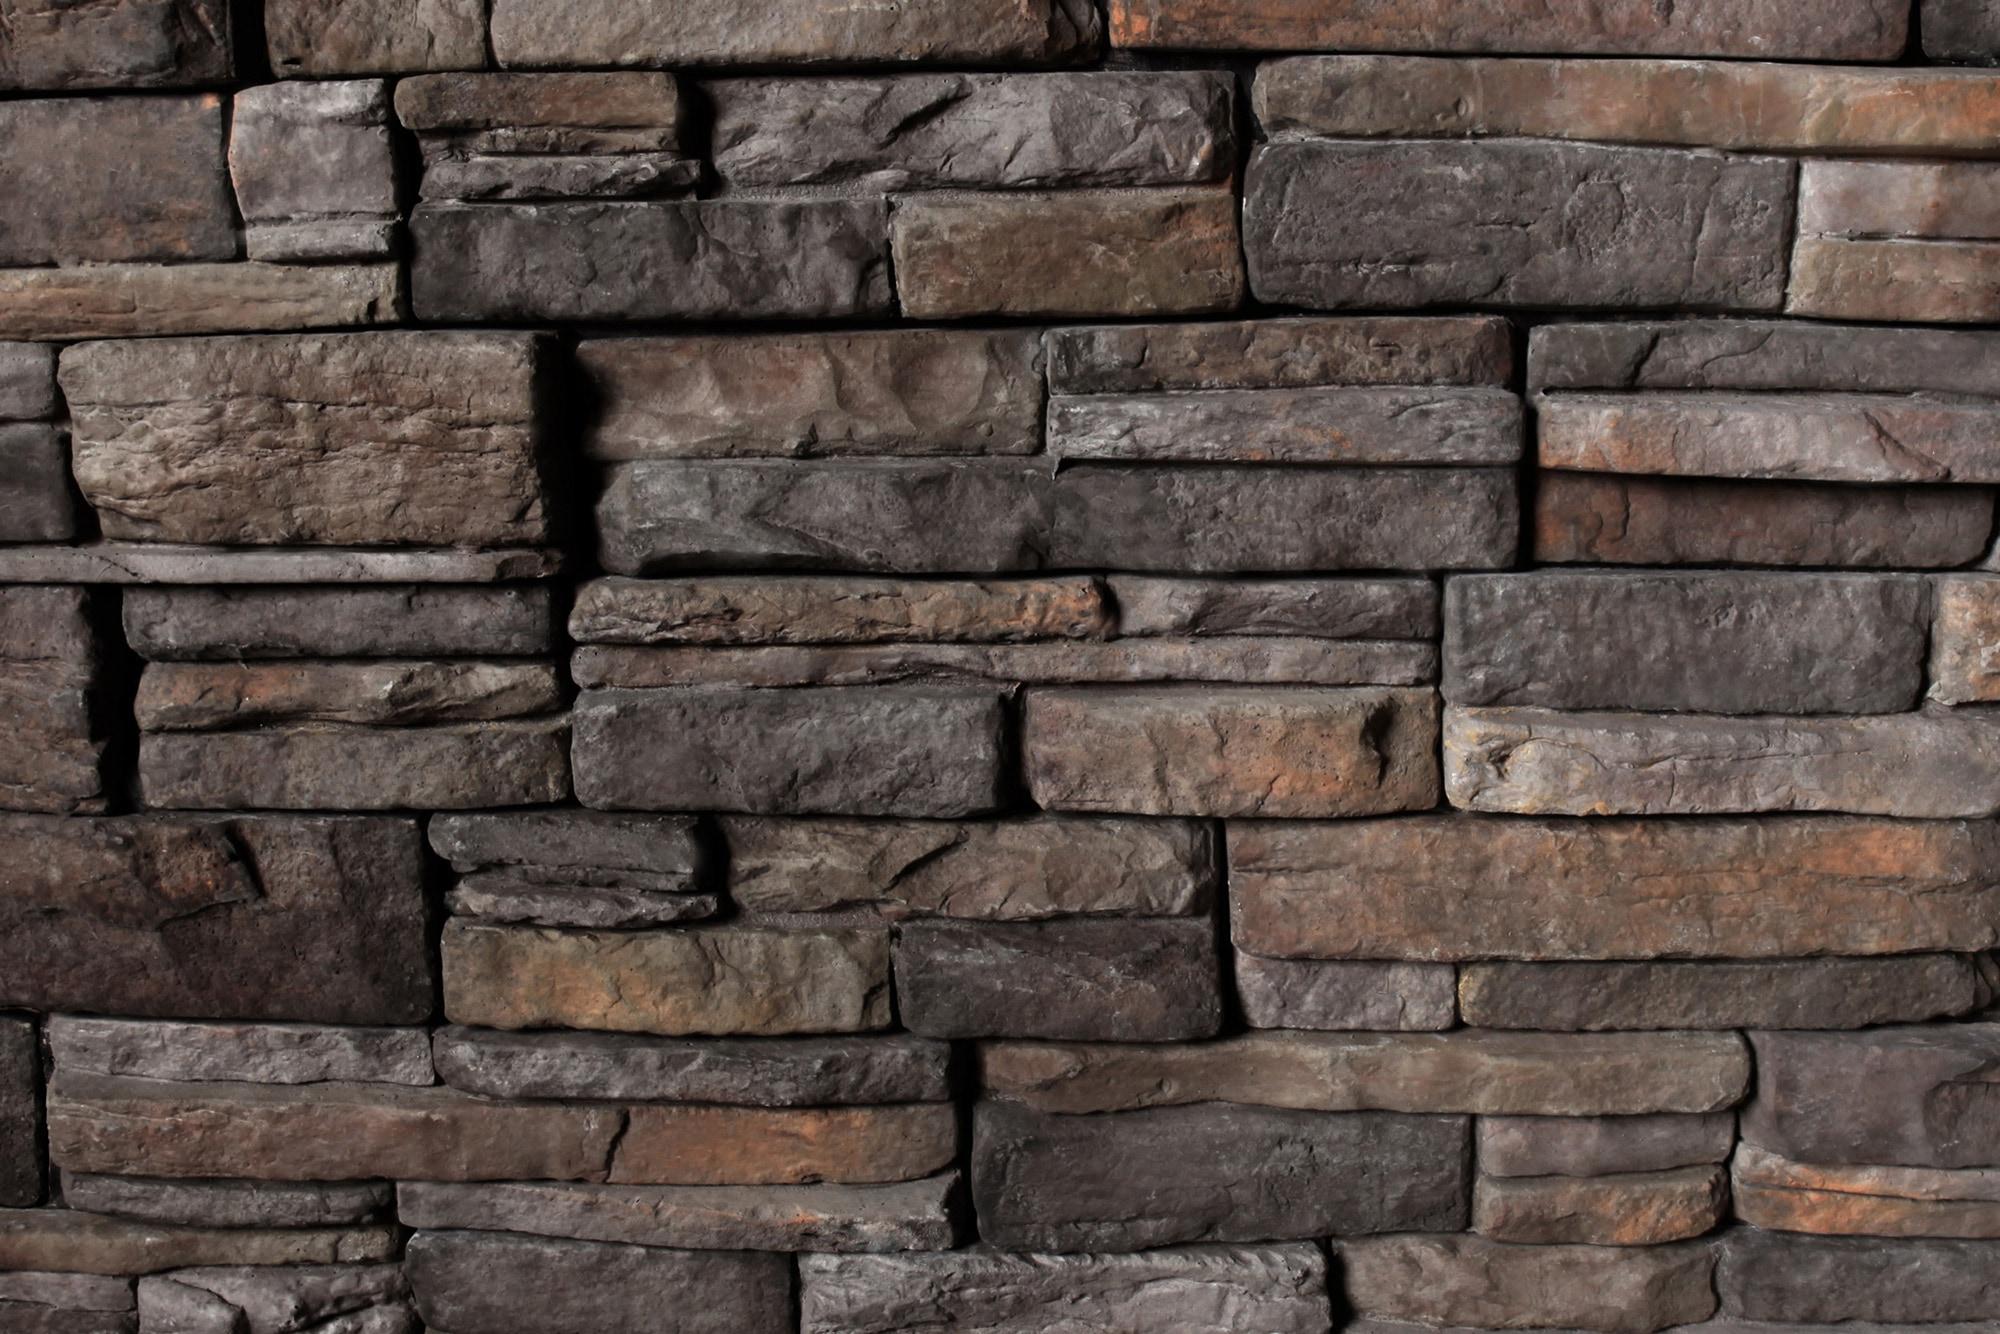 kodiak mountain stone manufactured stone veneer ready stack